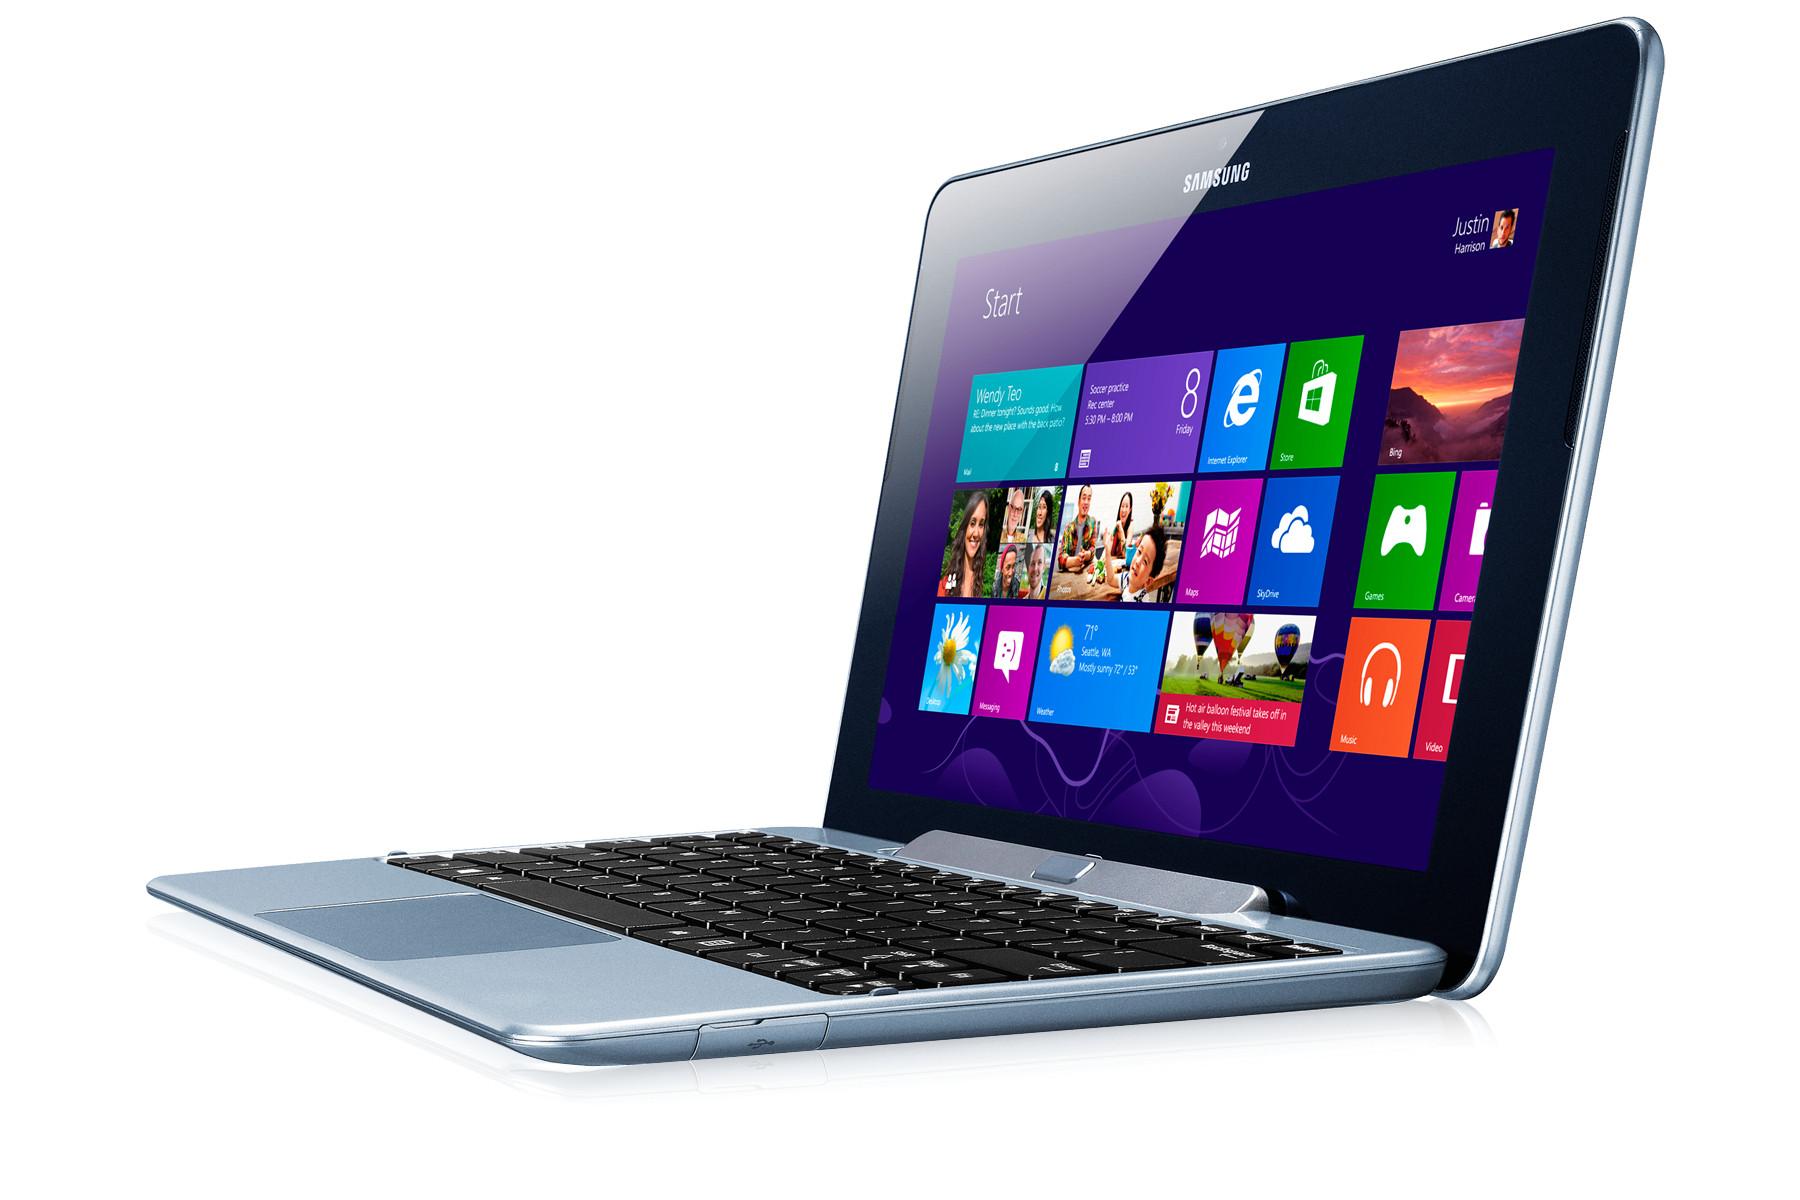 Review: Samsung ATIV Tab (GT-P8510) - SamMobile - SamMobile